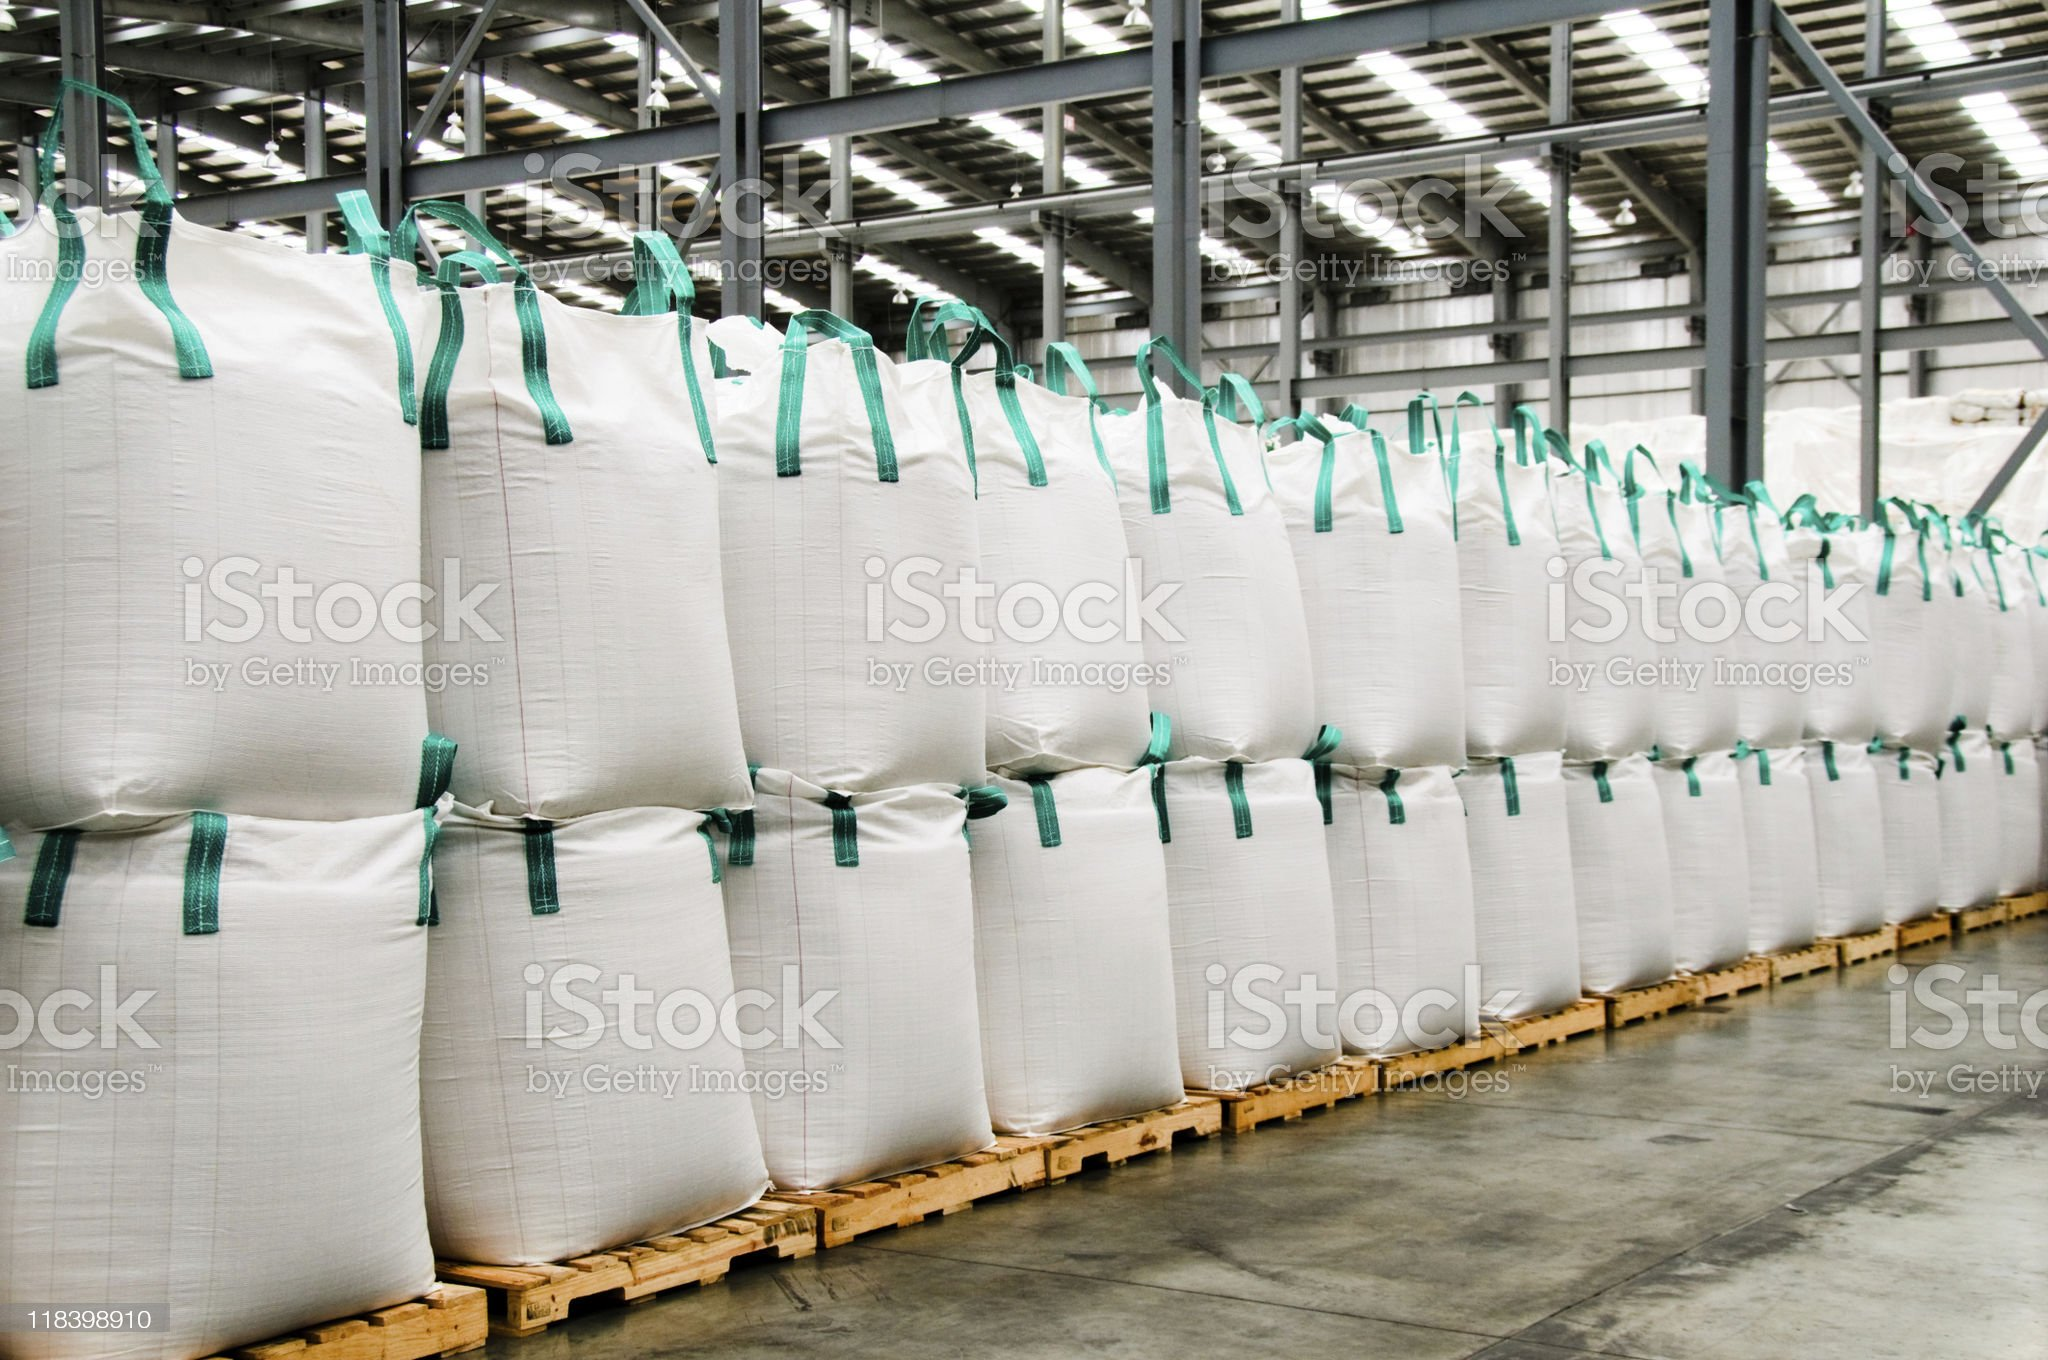 Stacks of sacks. royalty-free stock photo